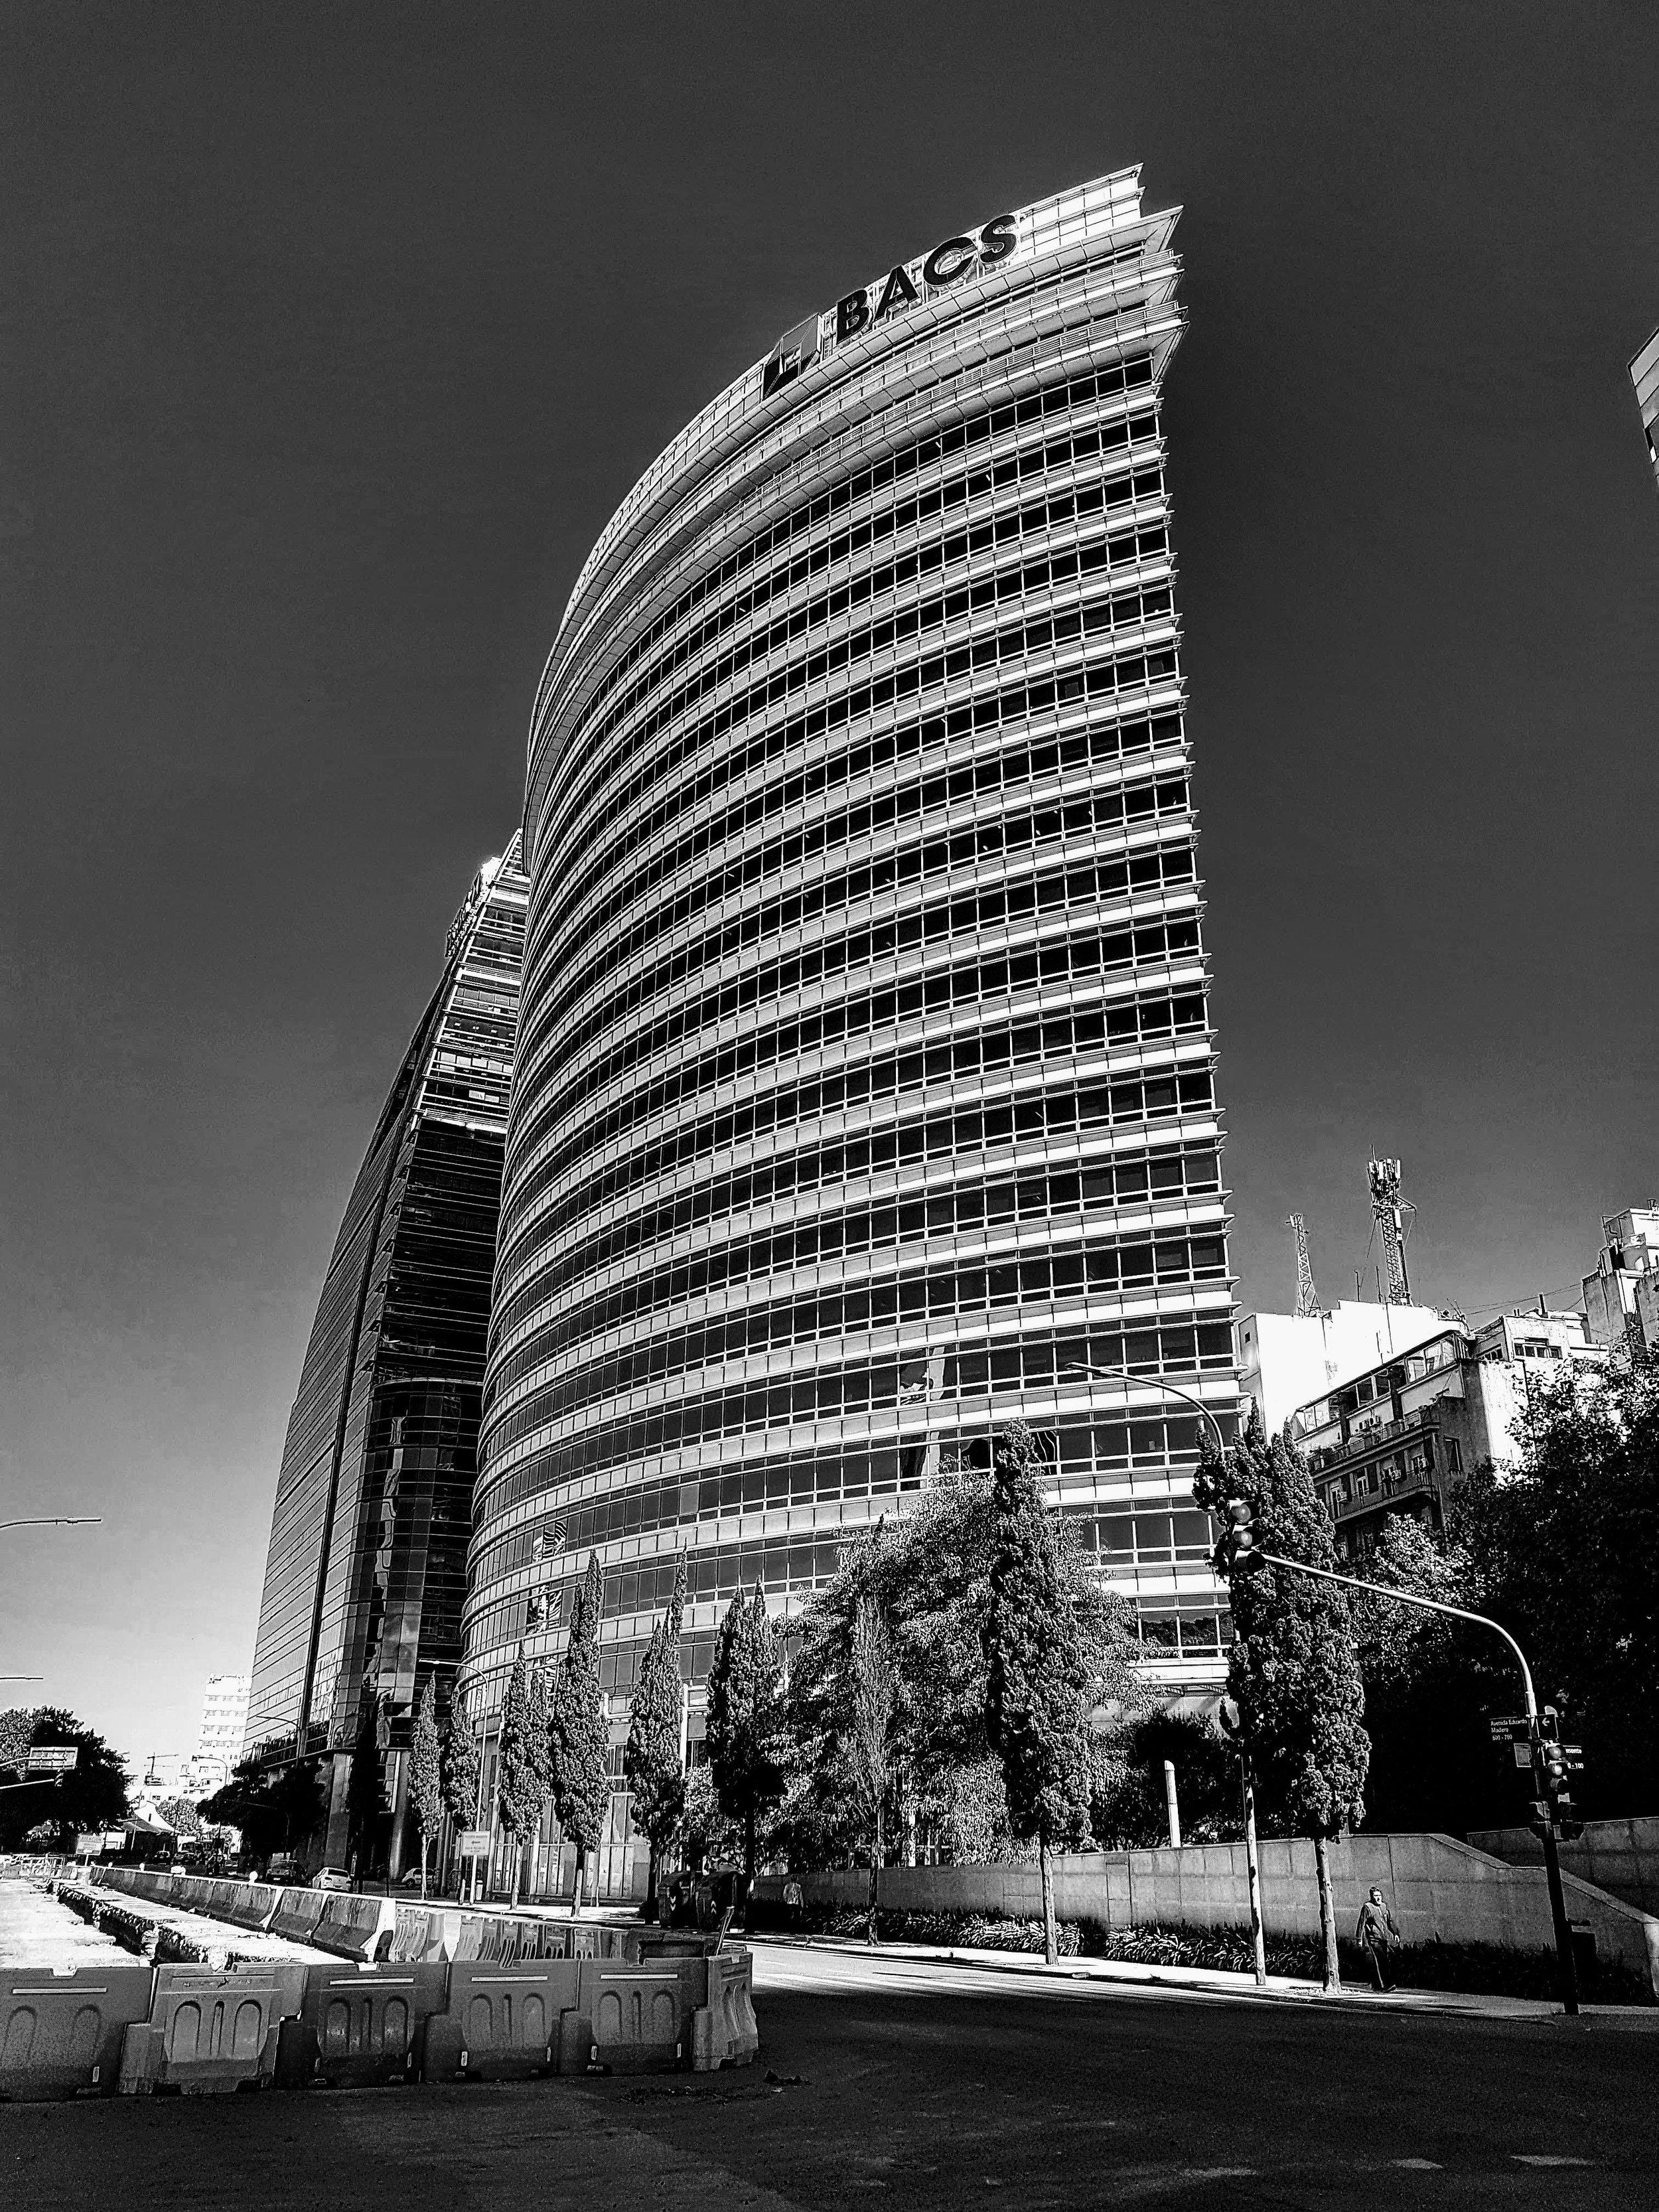 Edificio Republica, Buenos Aires